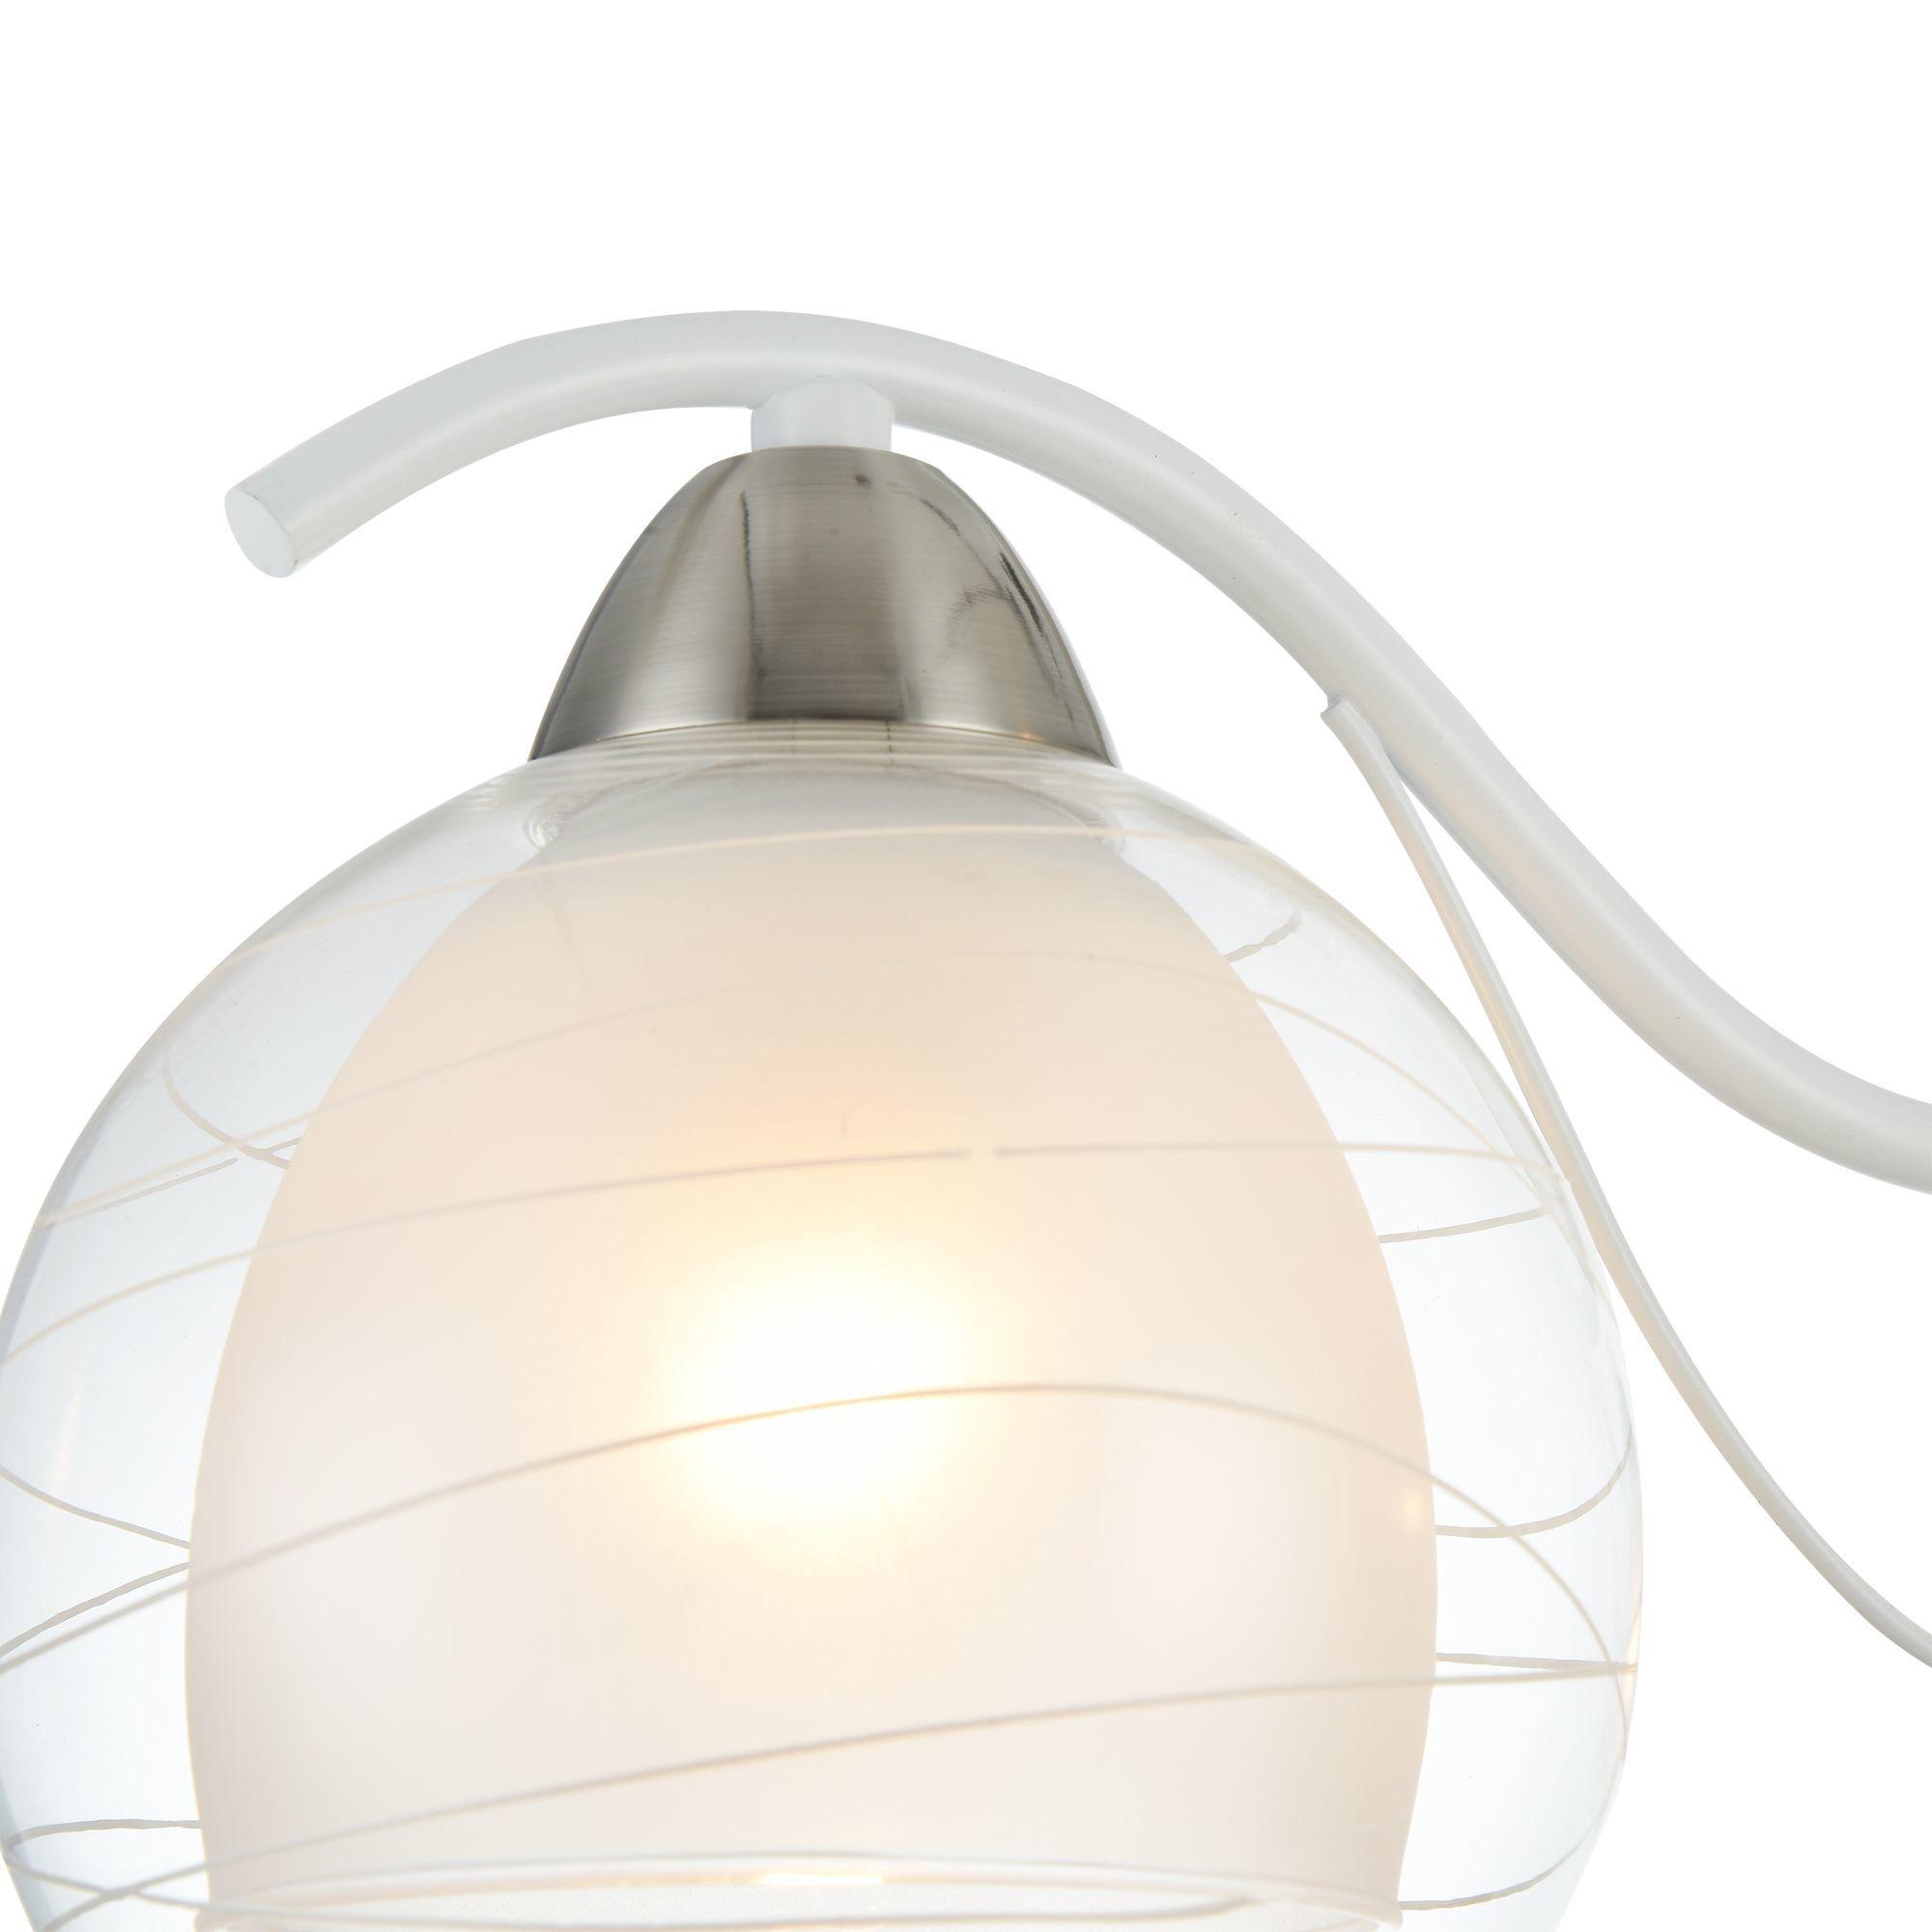 Потолочная люстра Freya Nikki FR5052-CL-03-W, 3xE14x60W, белый с никелем, белый с прозрачным, прозрачный с белым, металл, стекло - фото 7